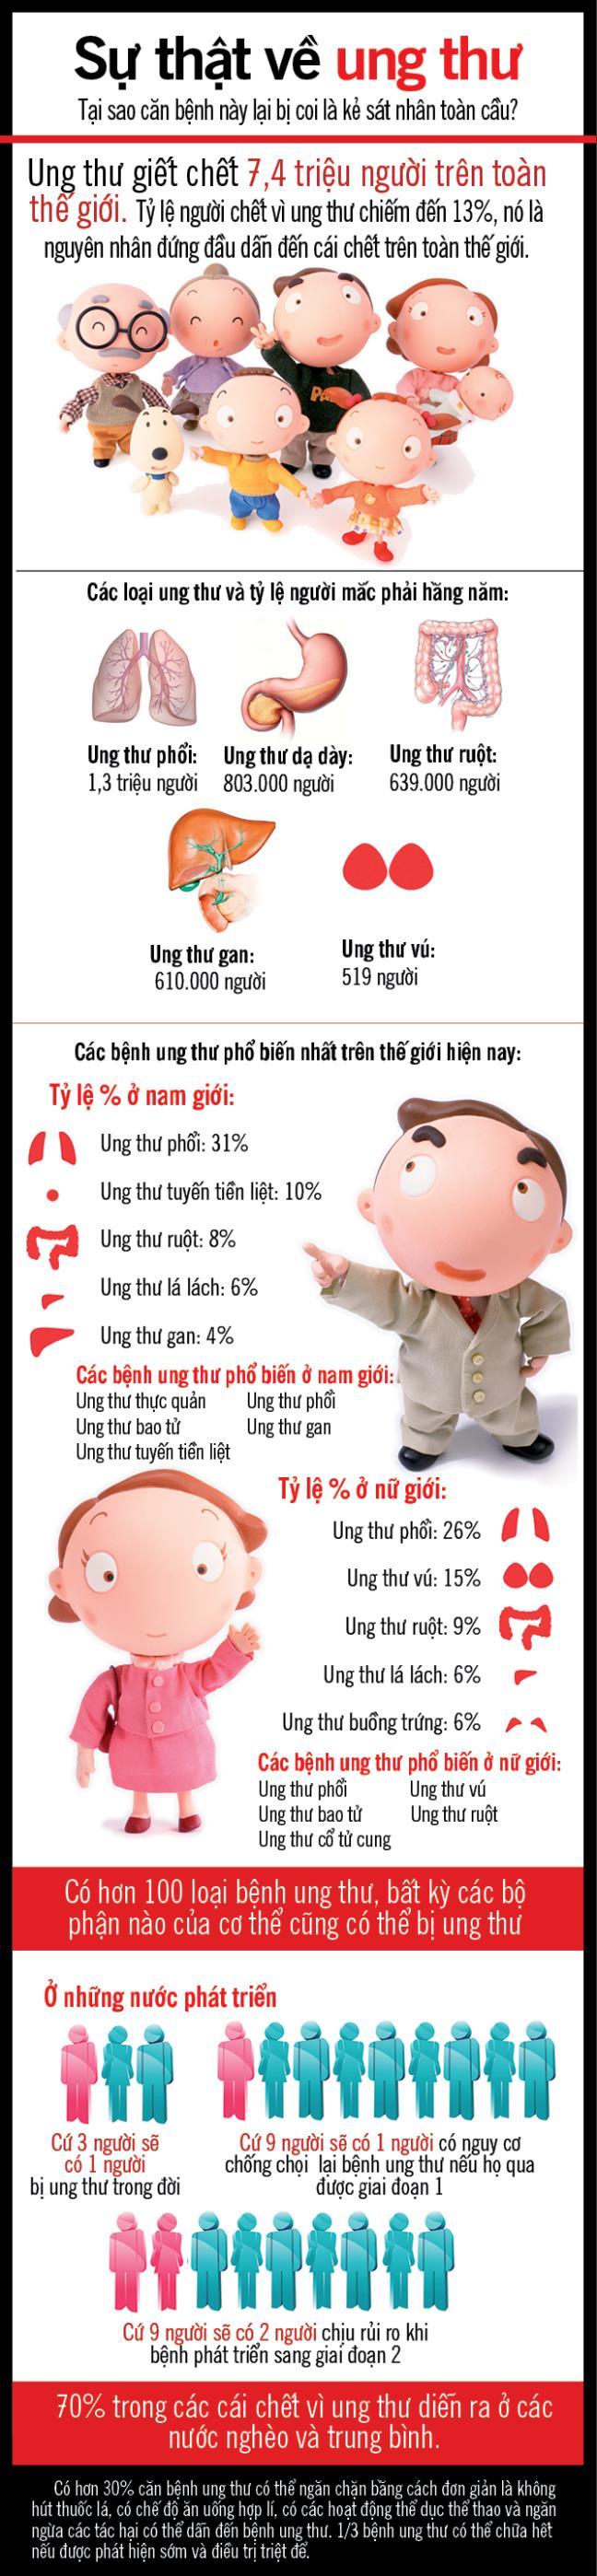 Su that ve ung thu- Tai sao can benh nay bi coi la ke sat nhan toan cau?